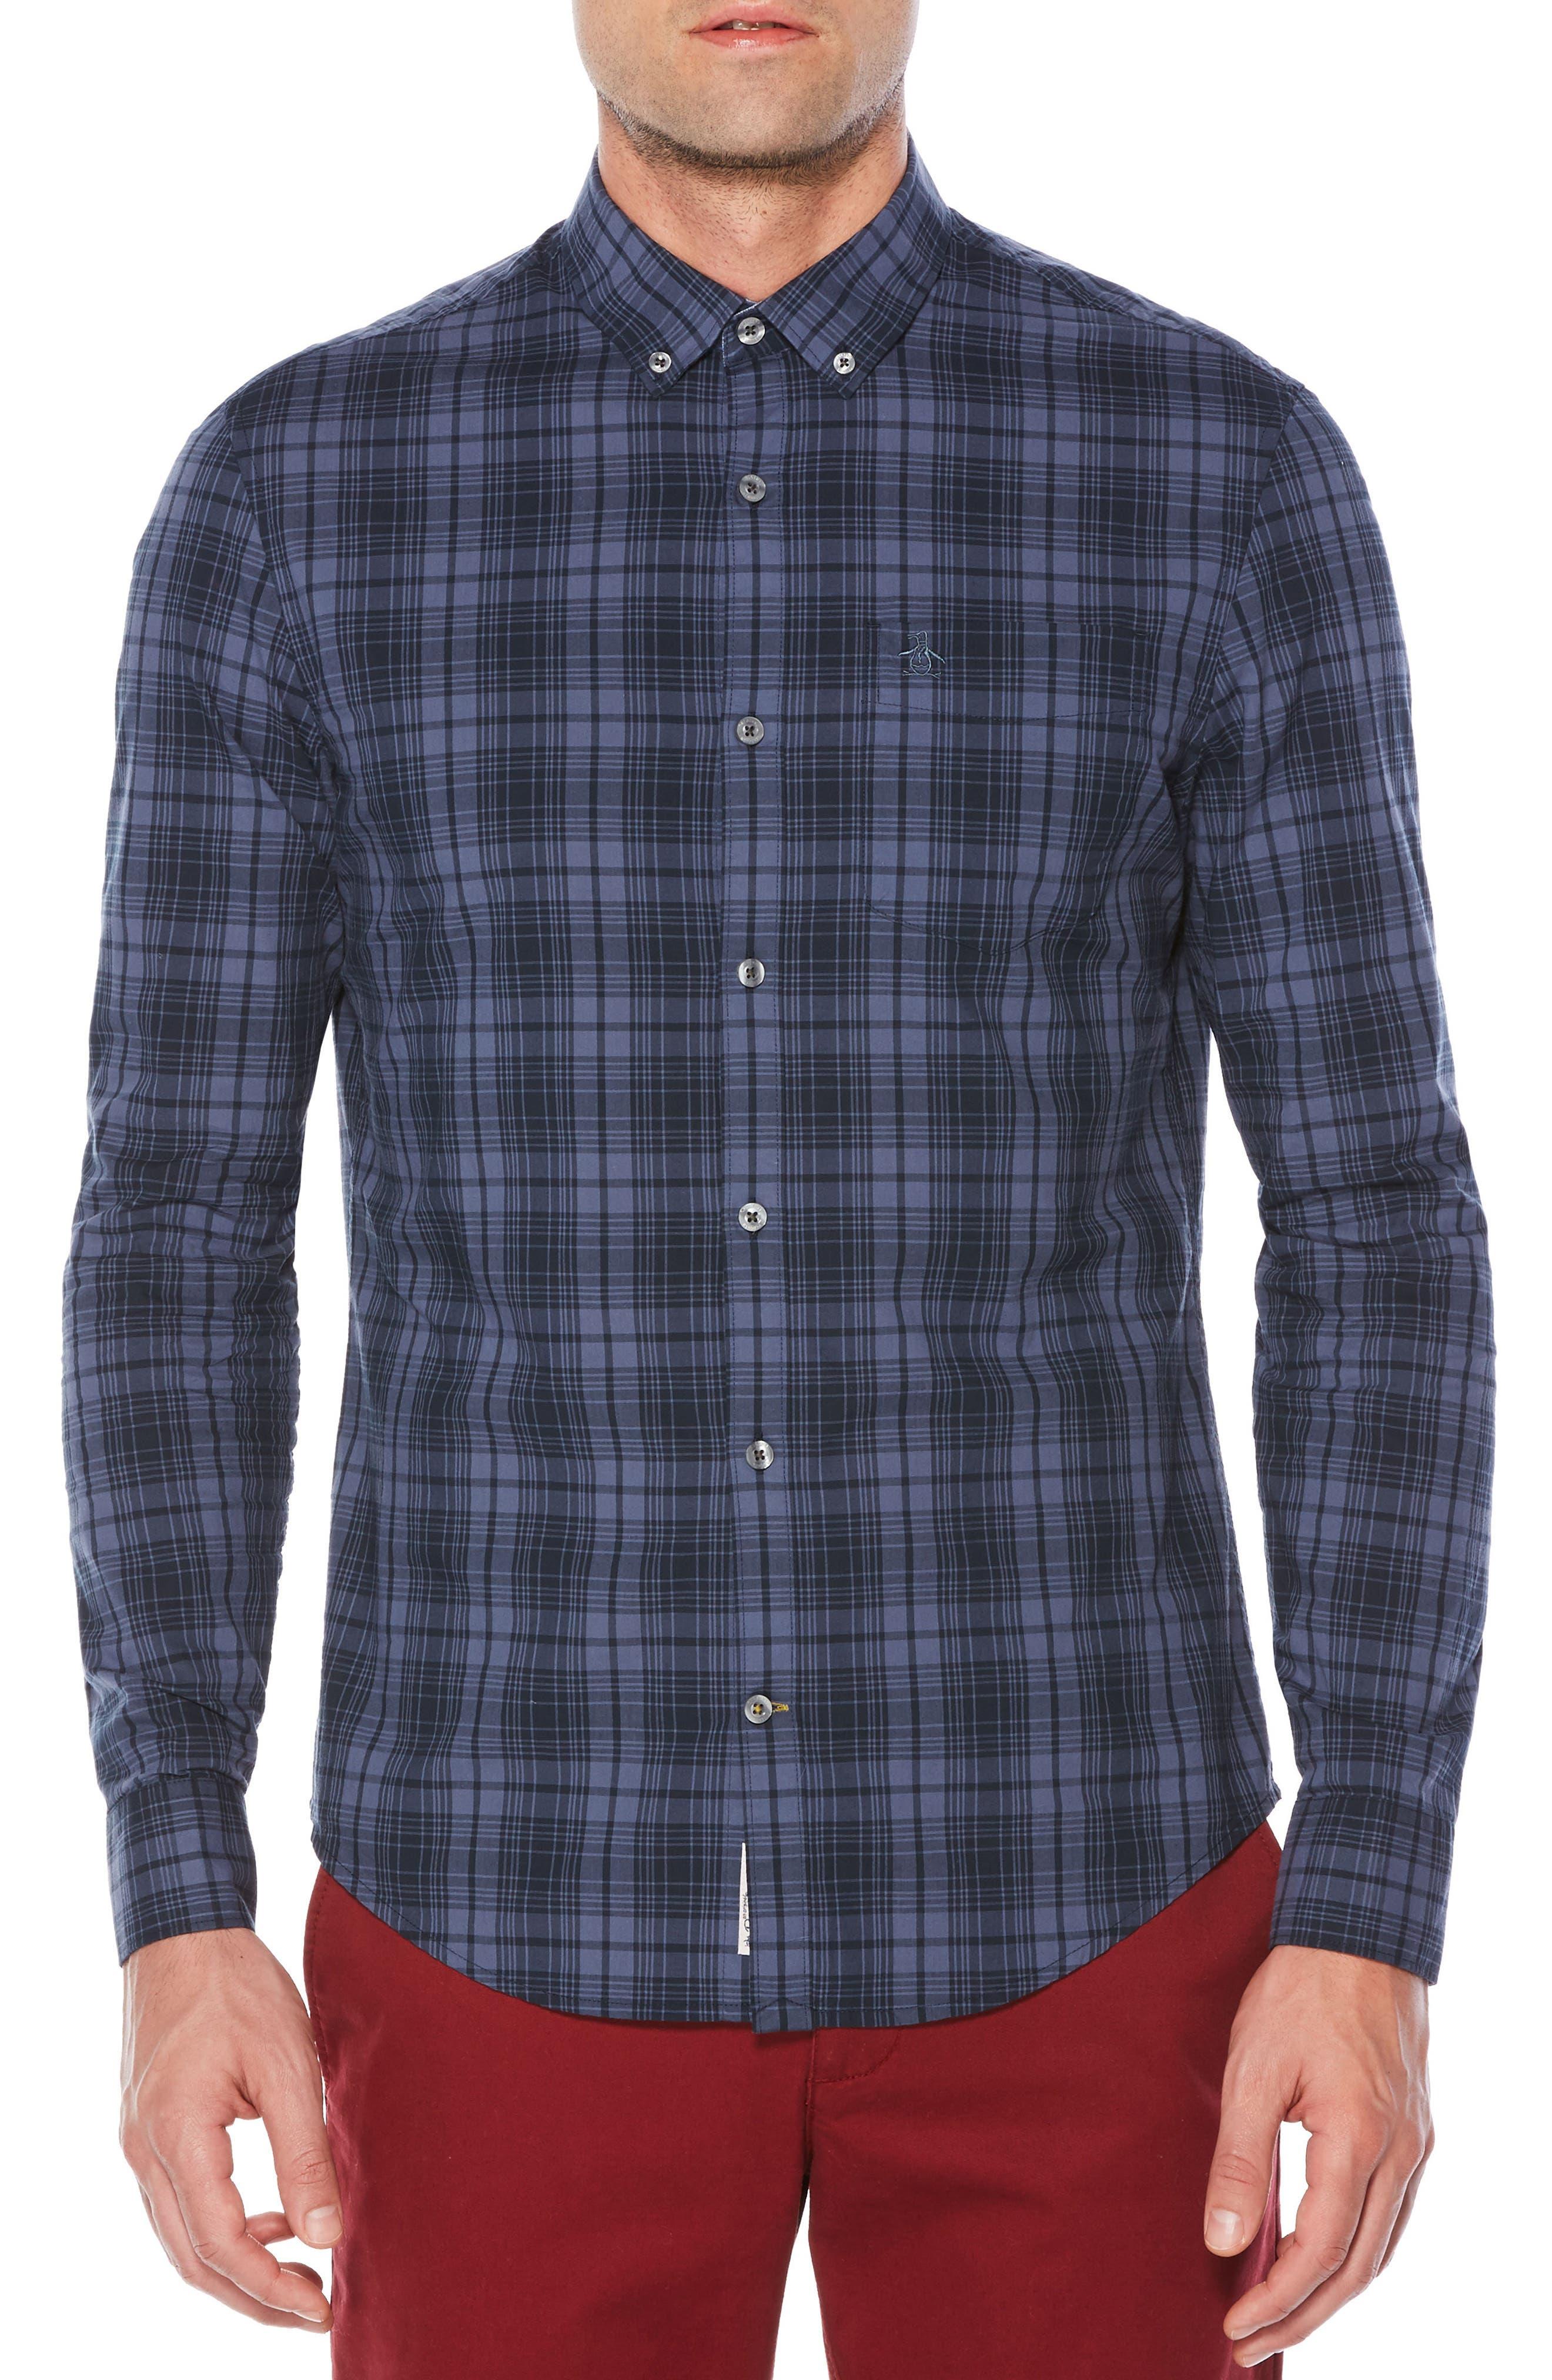 Heritage Slim Fit Plaid Shirt,                             Main thumbnail 1, color,                             Vintage Indigo